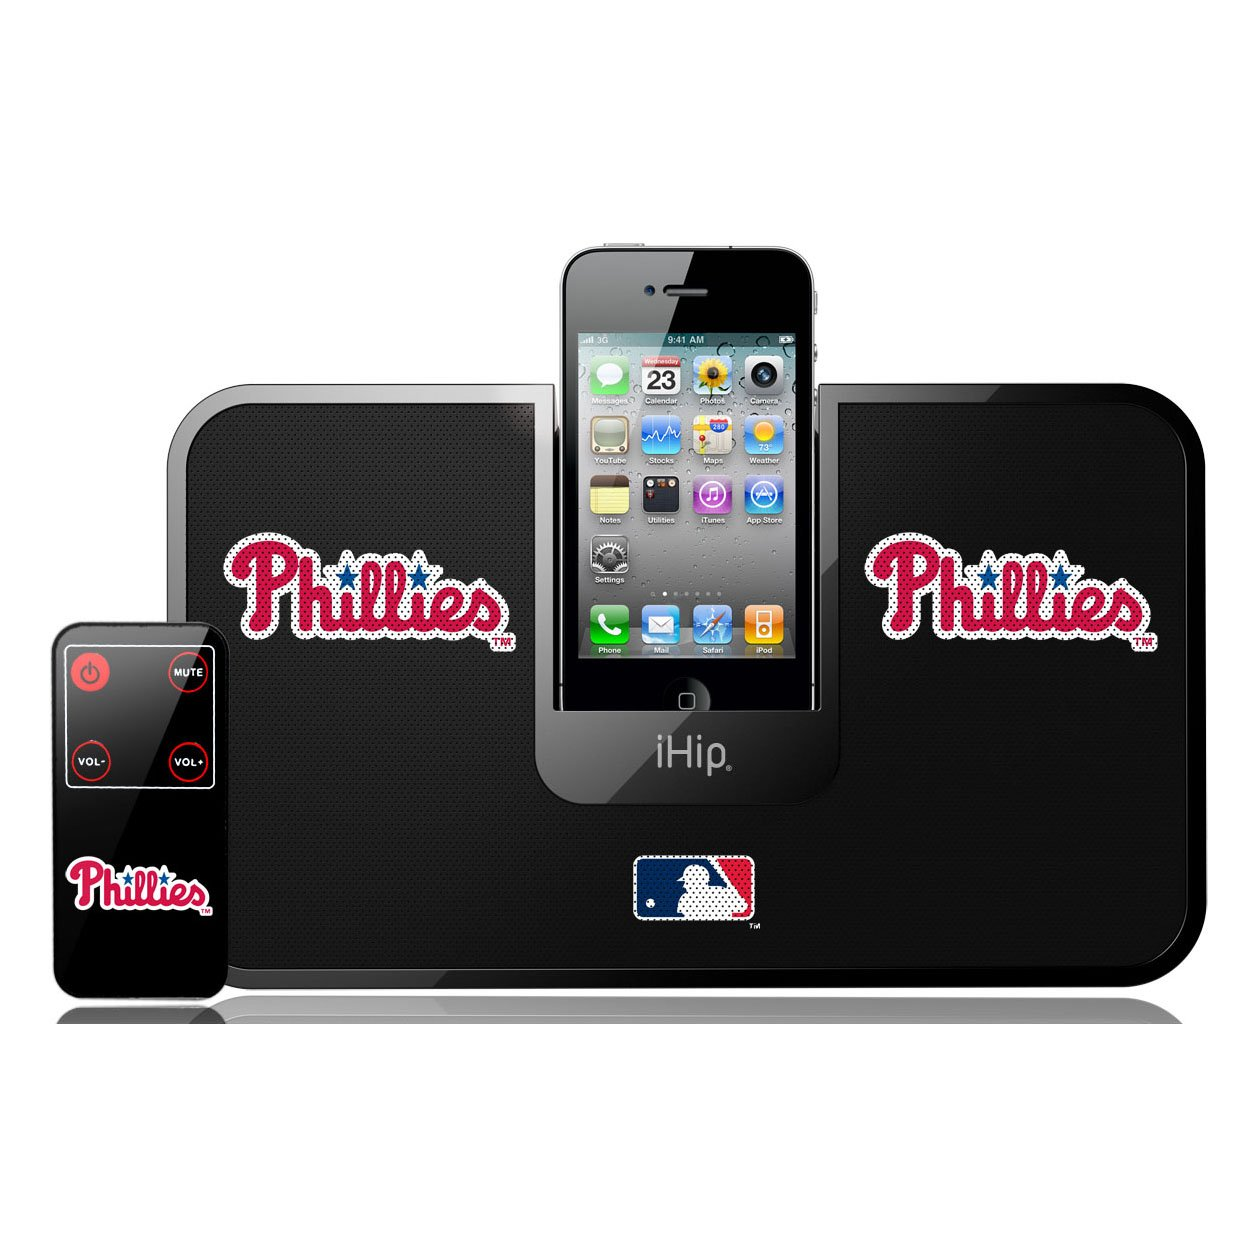 iHip Official MLB PHILADELPHIA PHILLIES Portable iDock Stereo Speaker with Wireless Remote MLV5000PHL